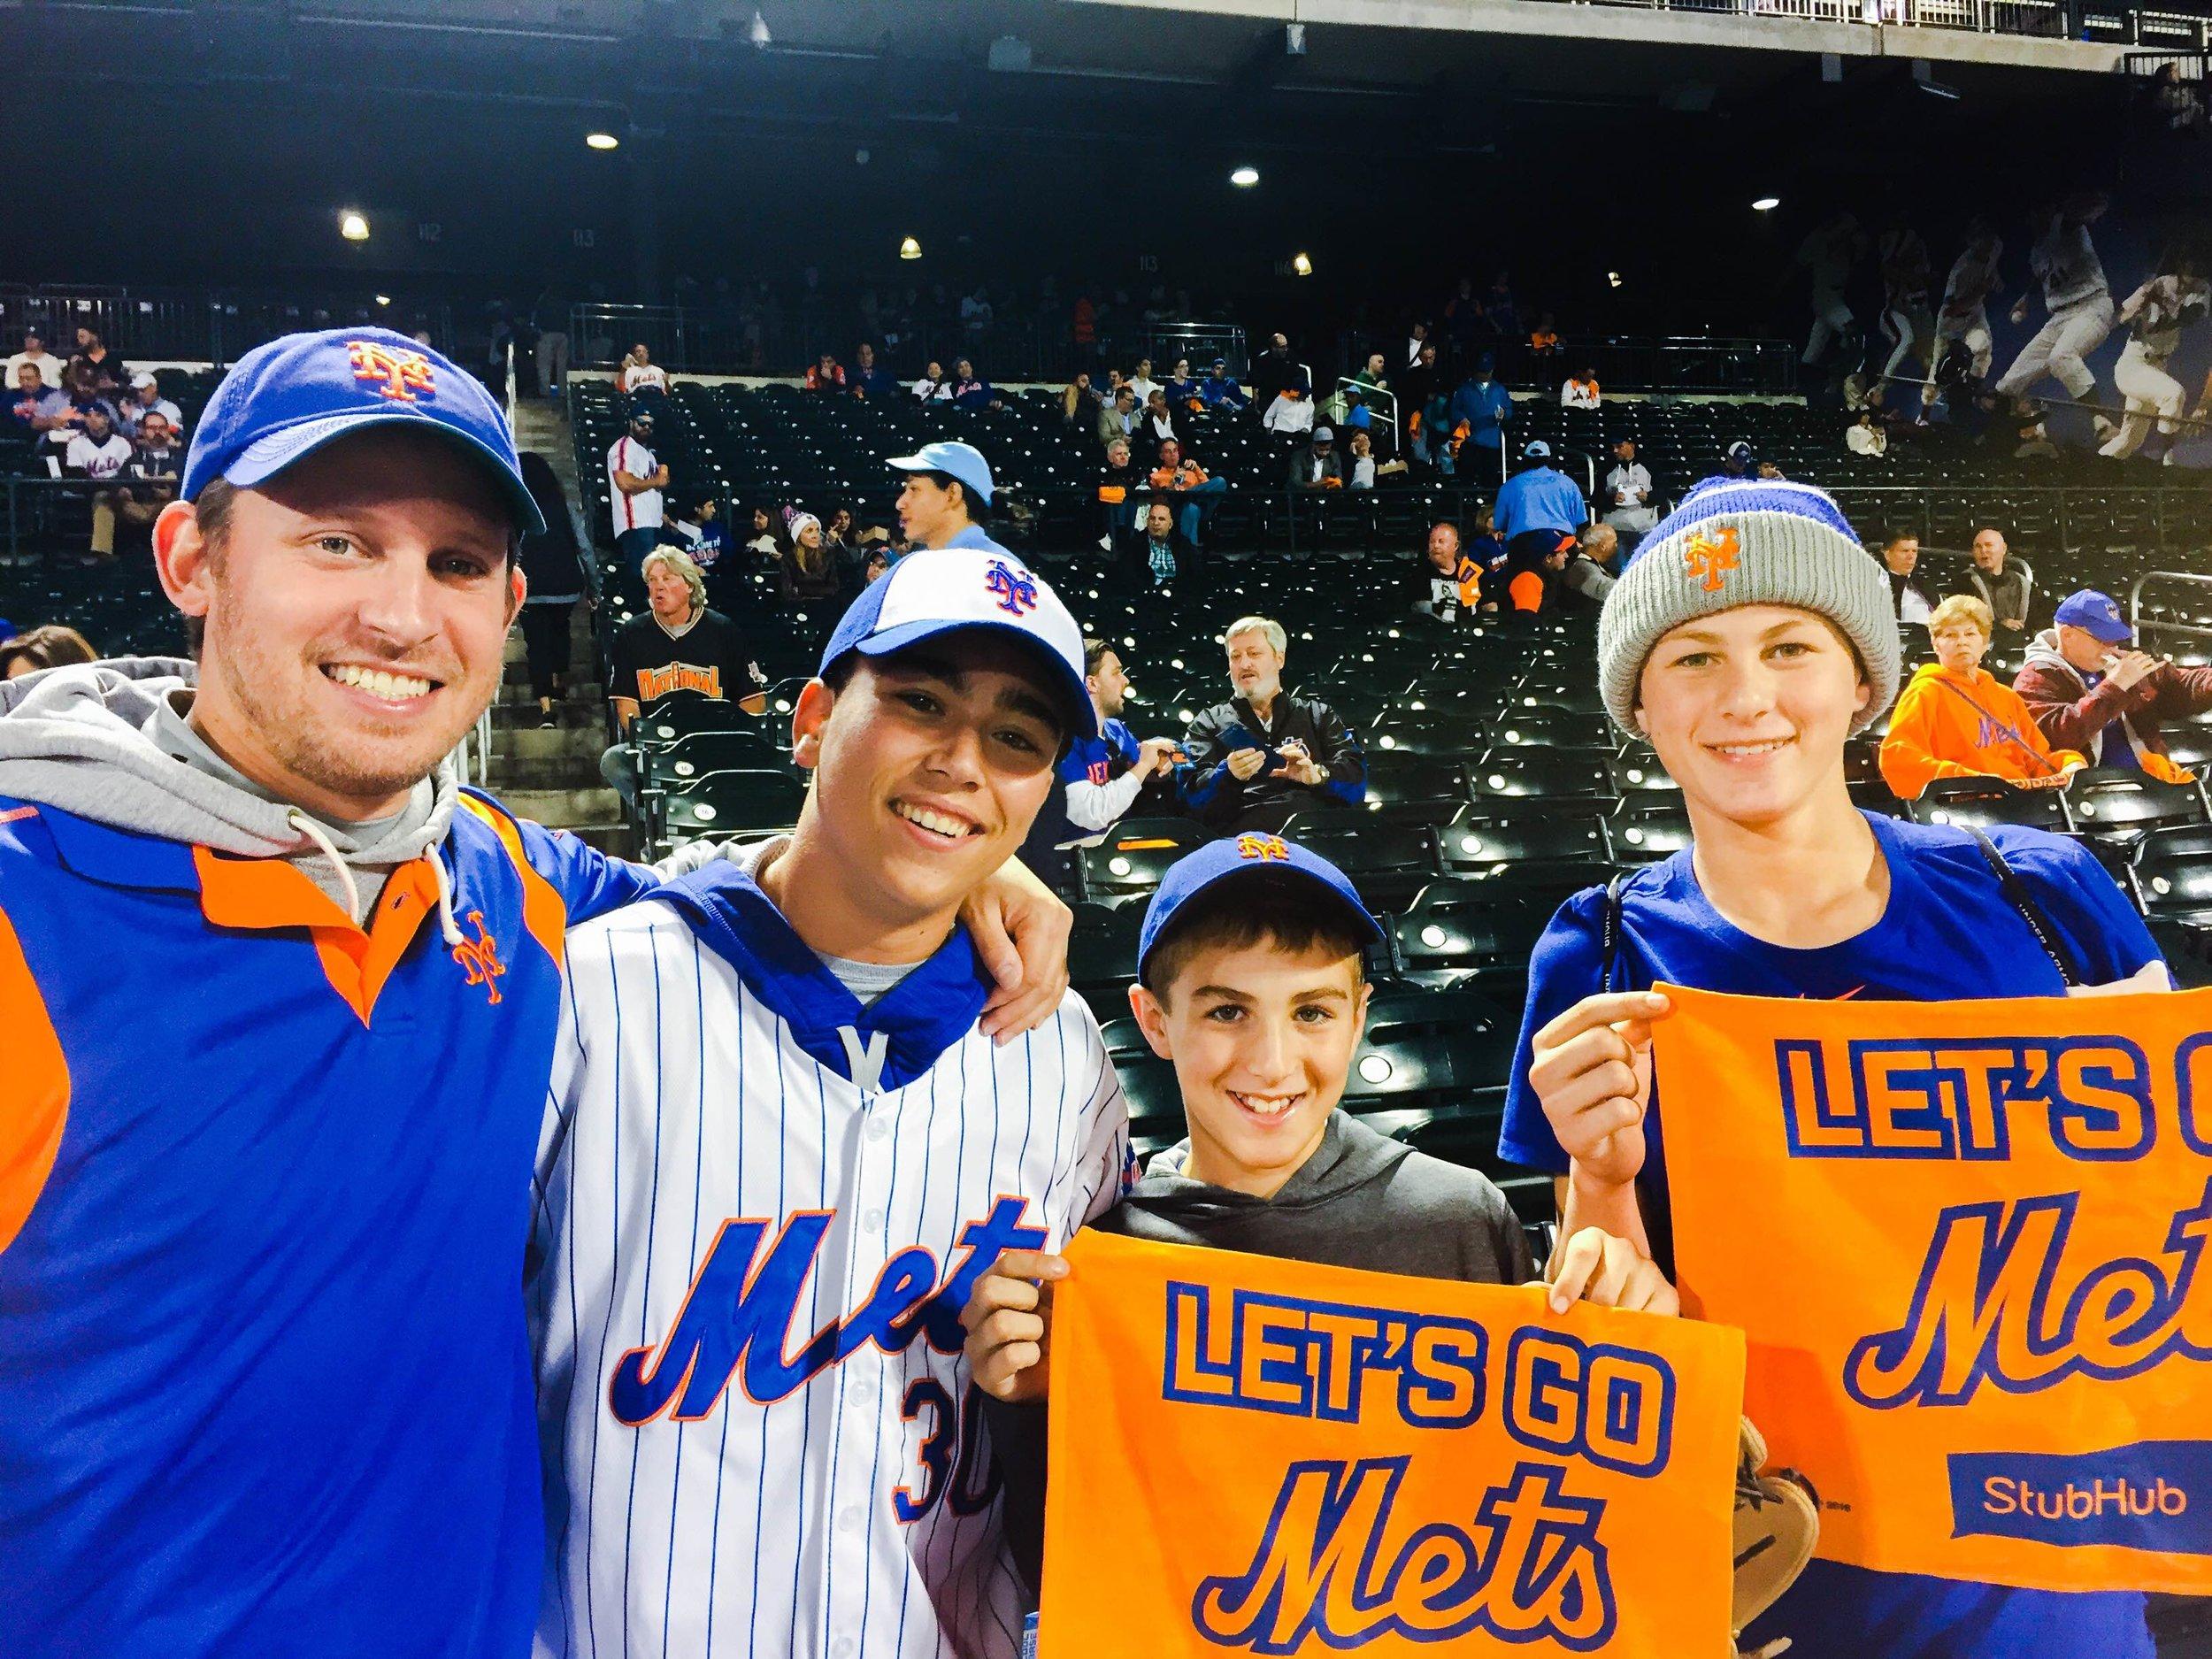 Cory, Ryan, Ethan, and Jeff